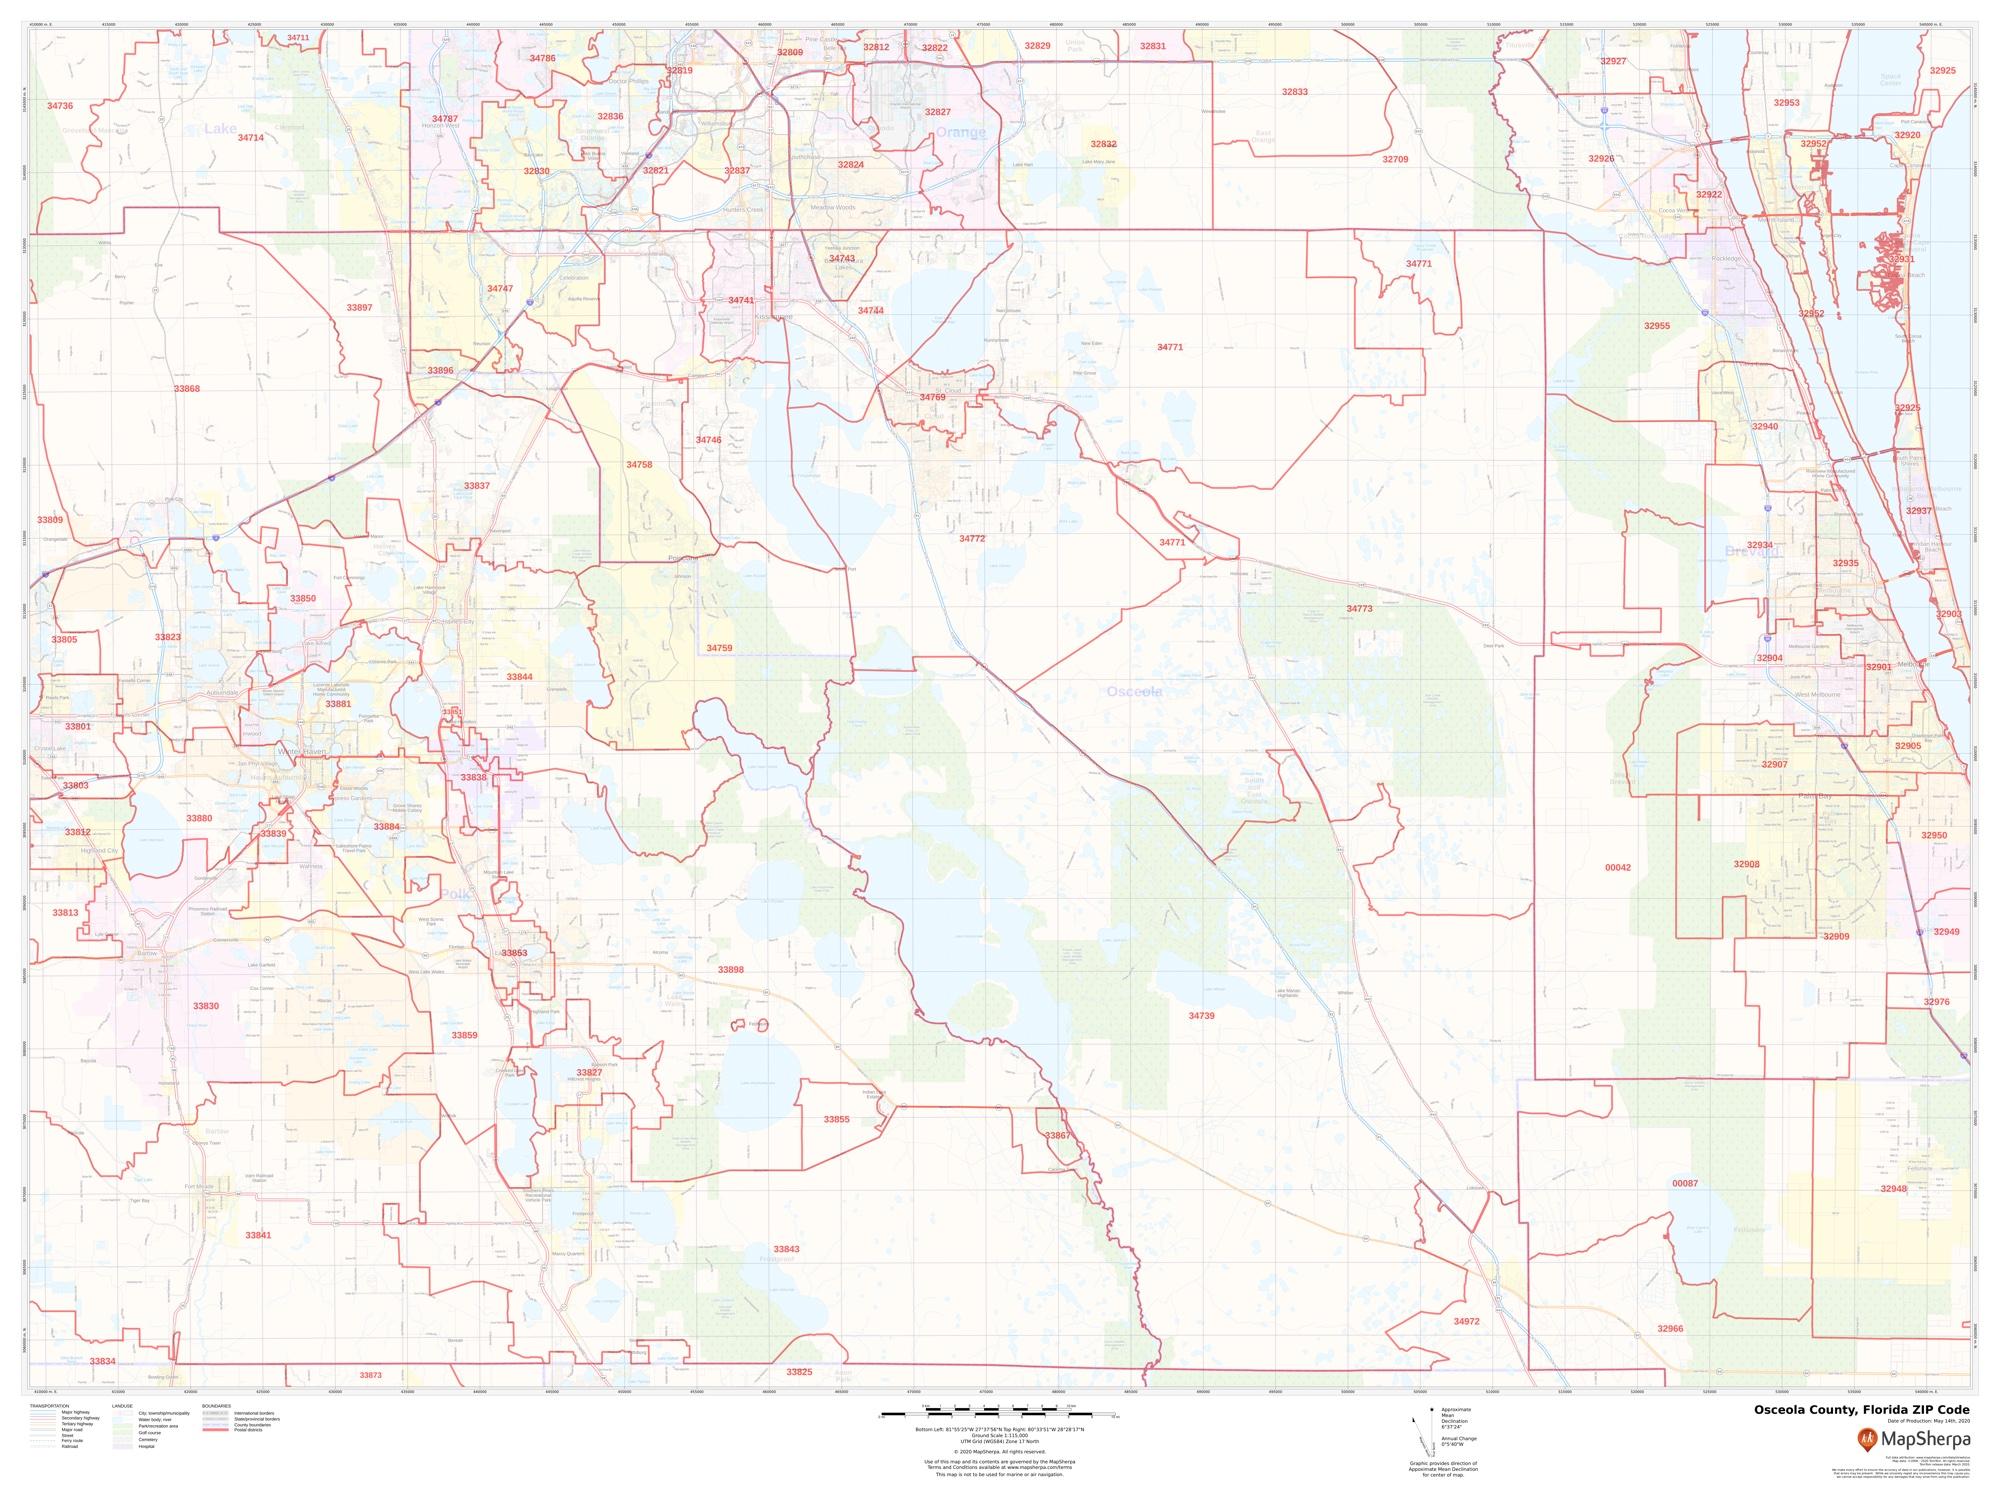 osceola county, florida zip code